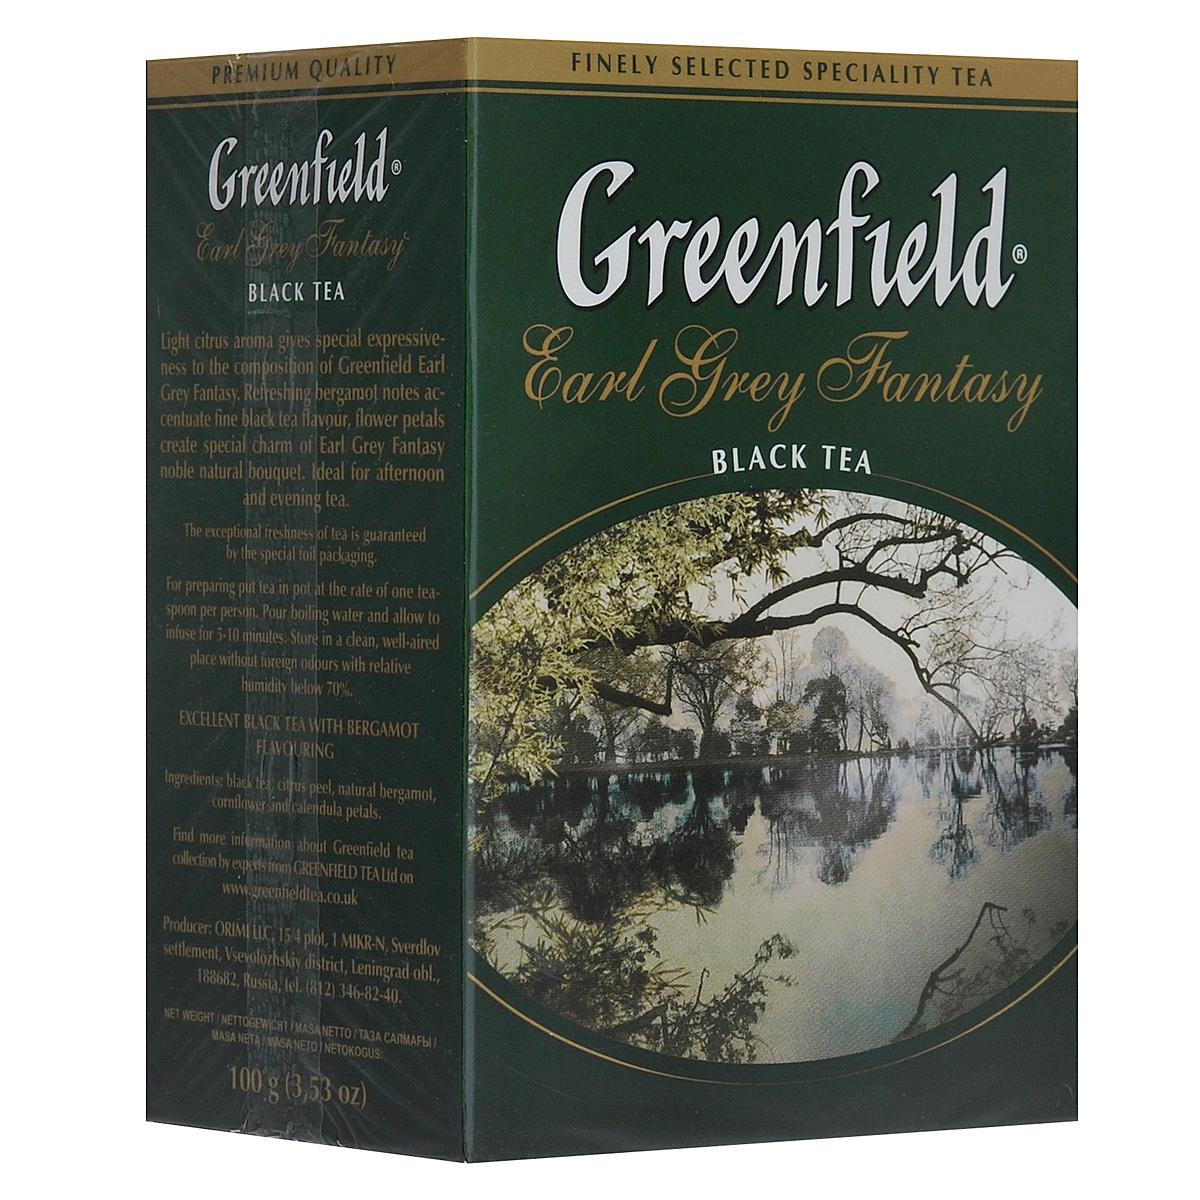 Greenfield Earl Grey Fantasy черный листовой чай, 100 г greenfield blueberry forest черный листовой чай 250 г